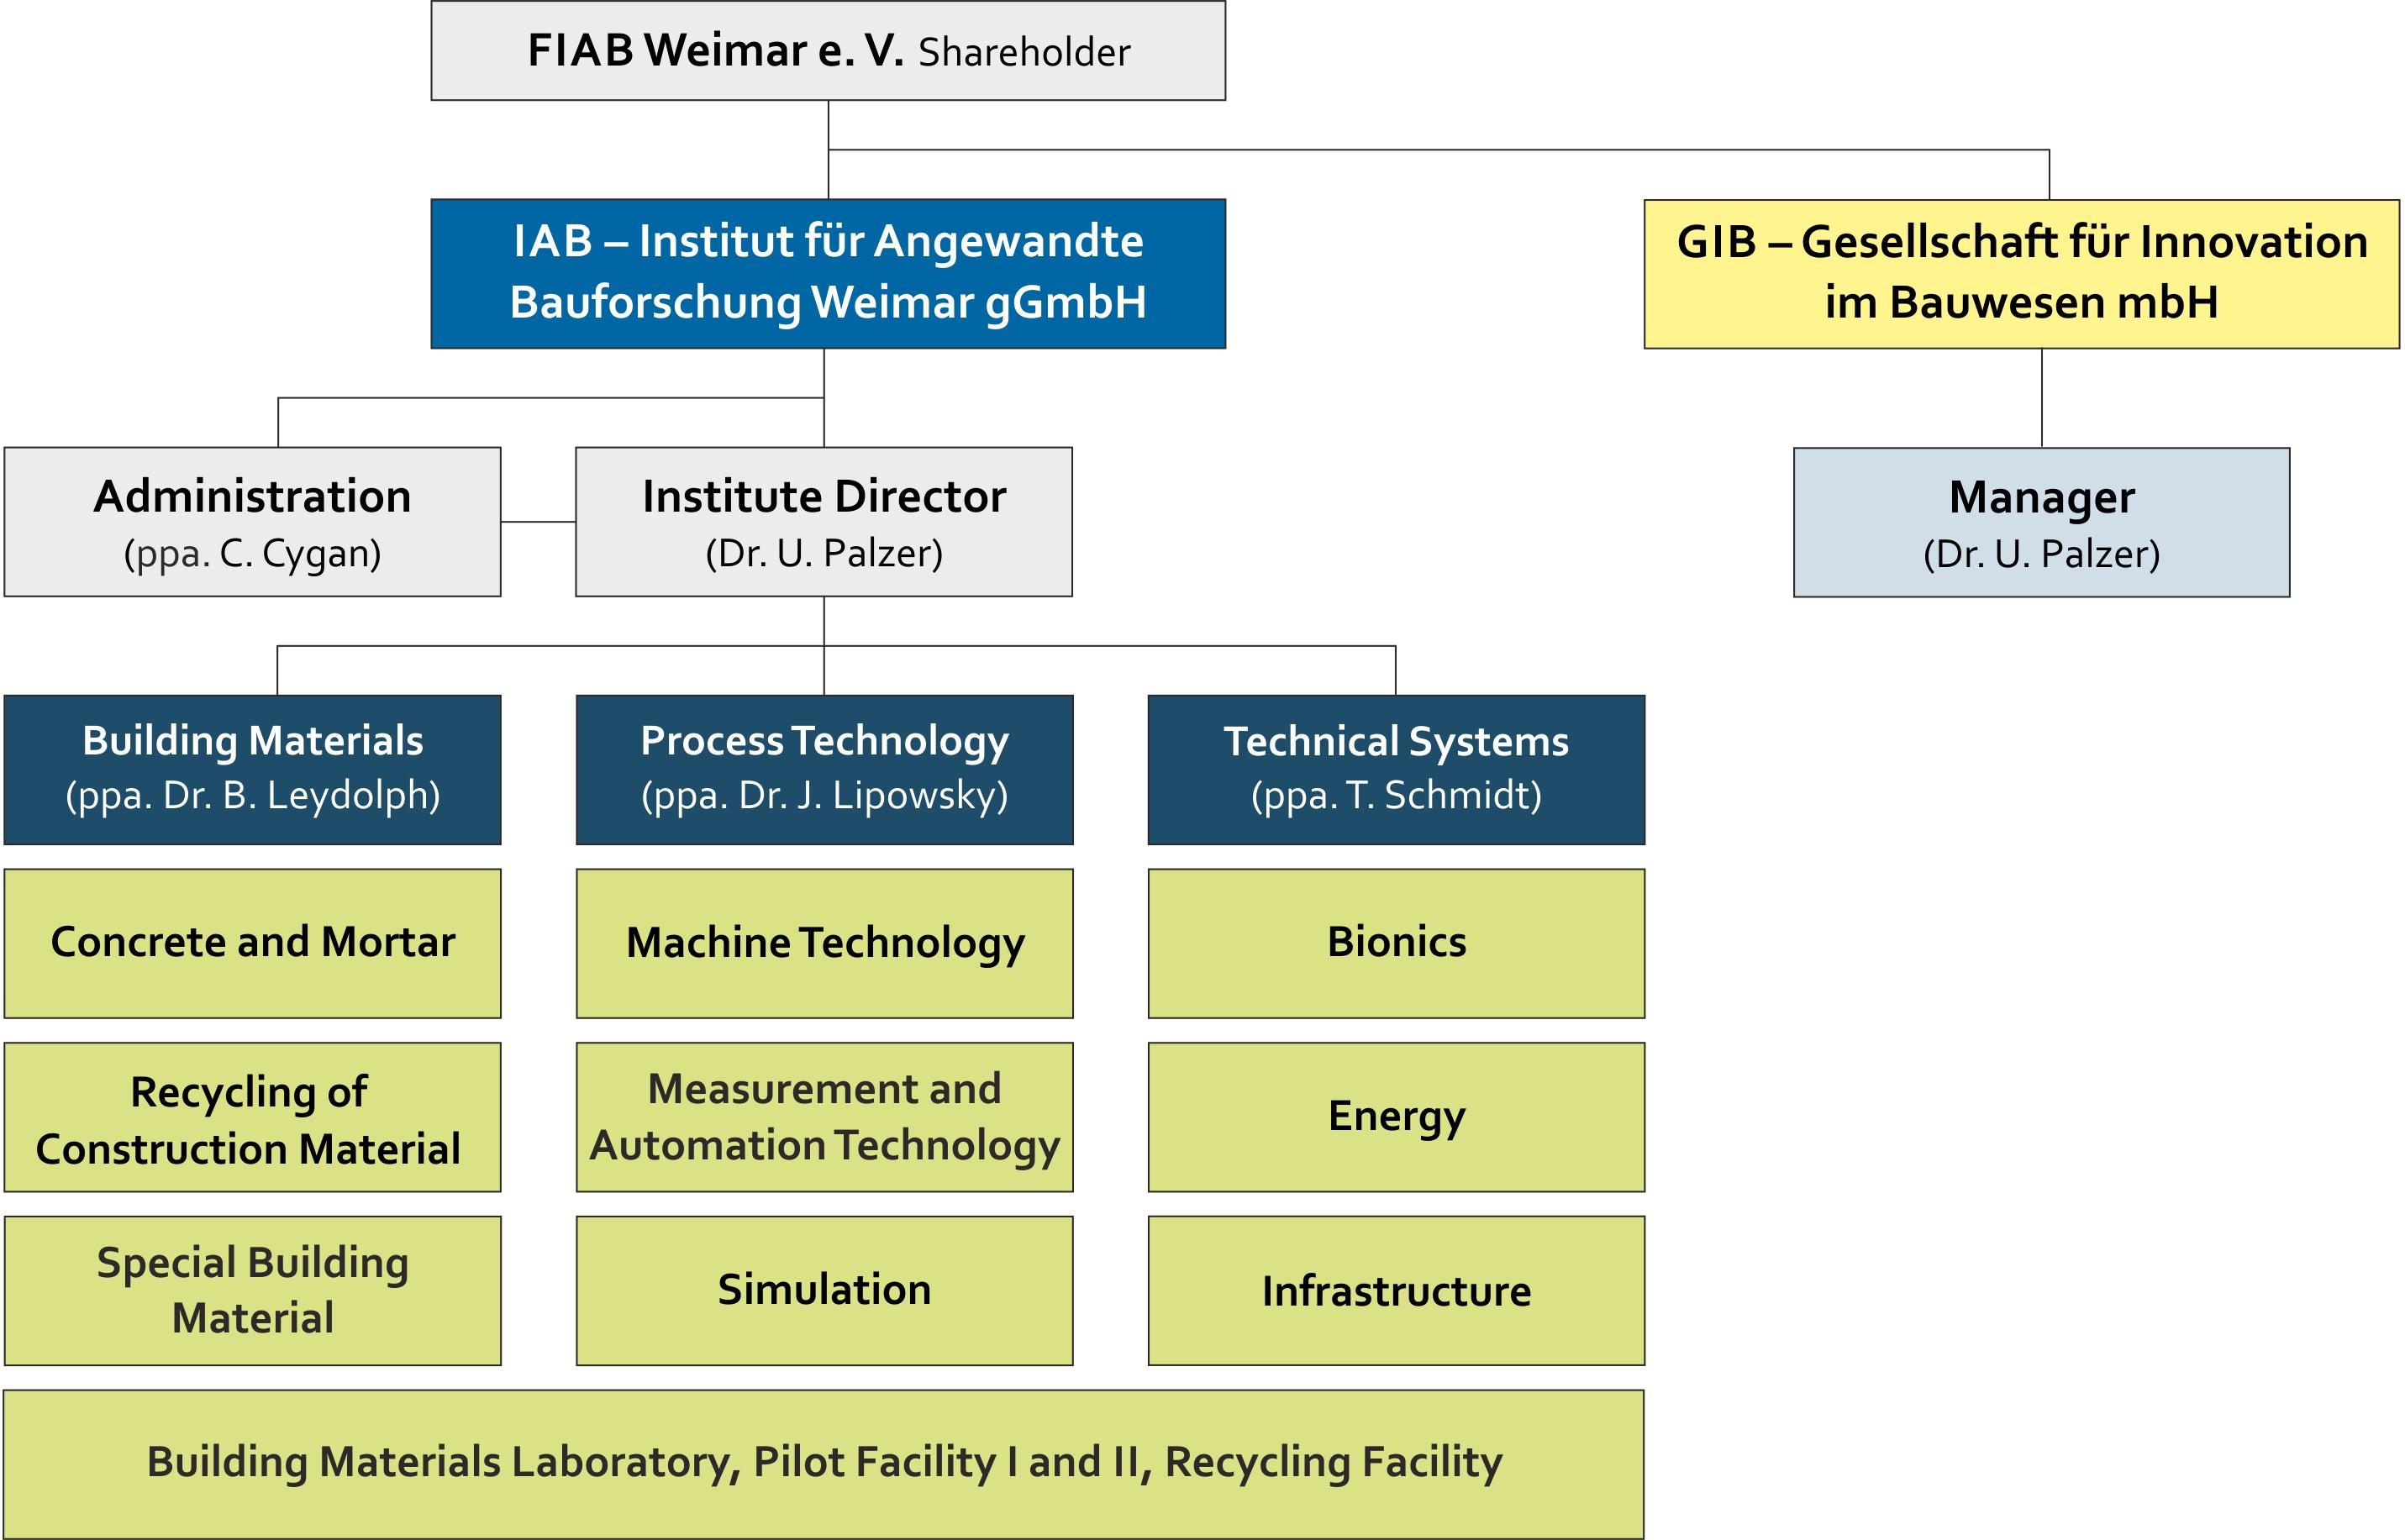 Image organization chart IAB Weimar